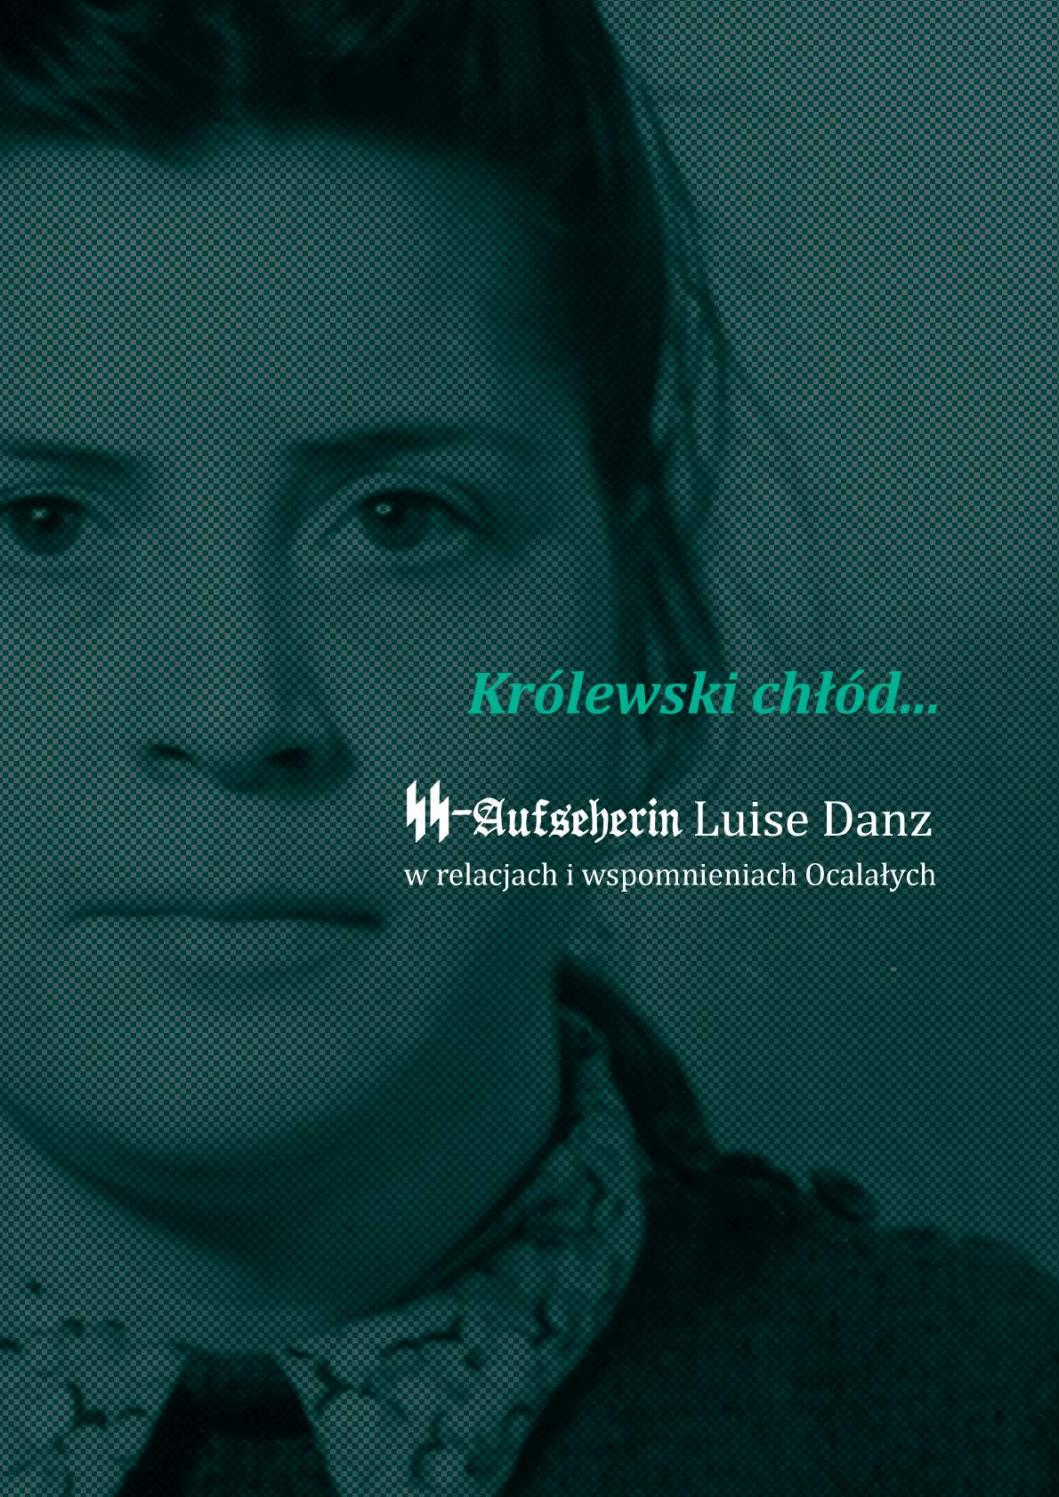 6e20836107aaca SS-Aufseherin Luise Danz by Joanna Czopowicz - issuu